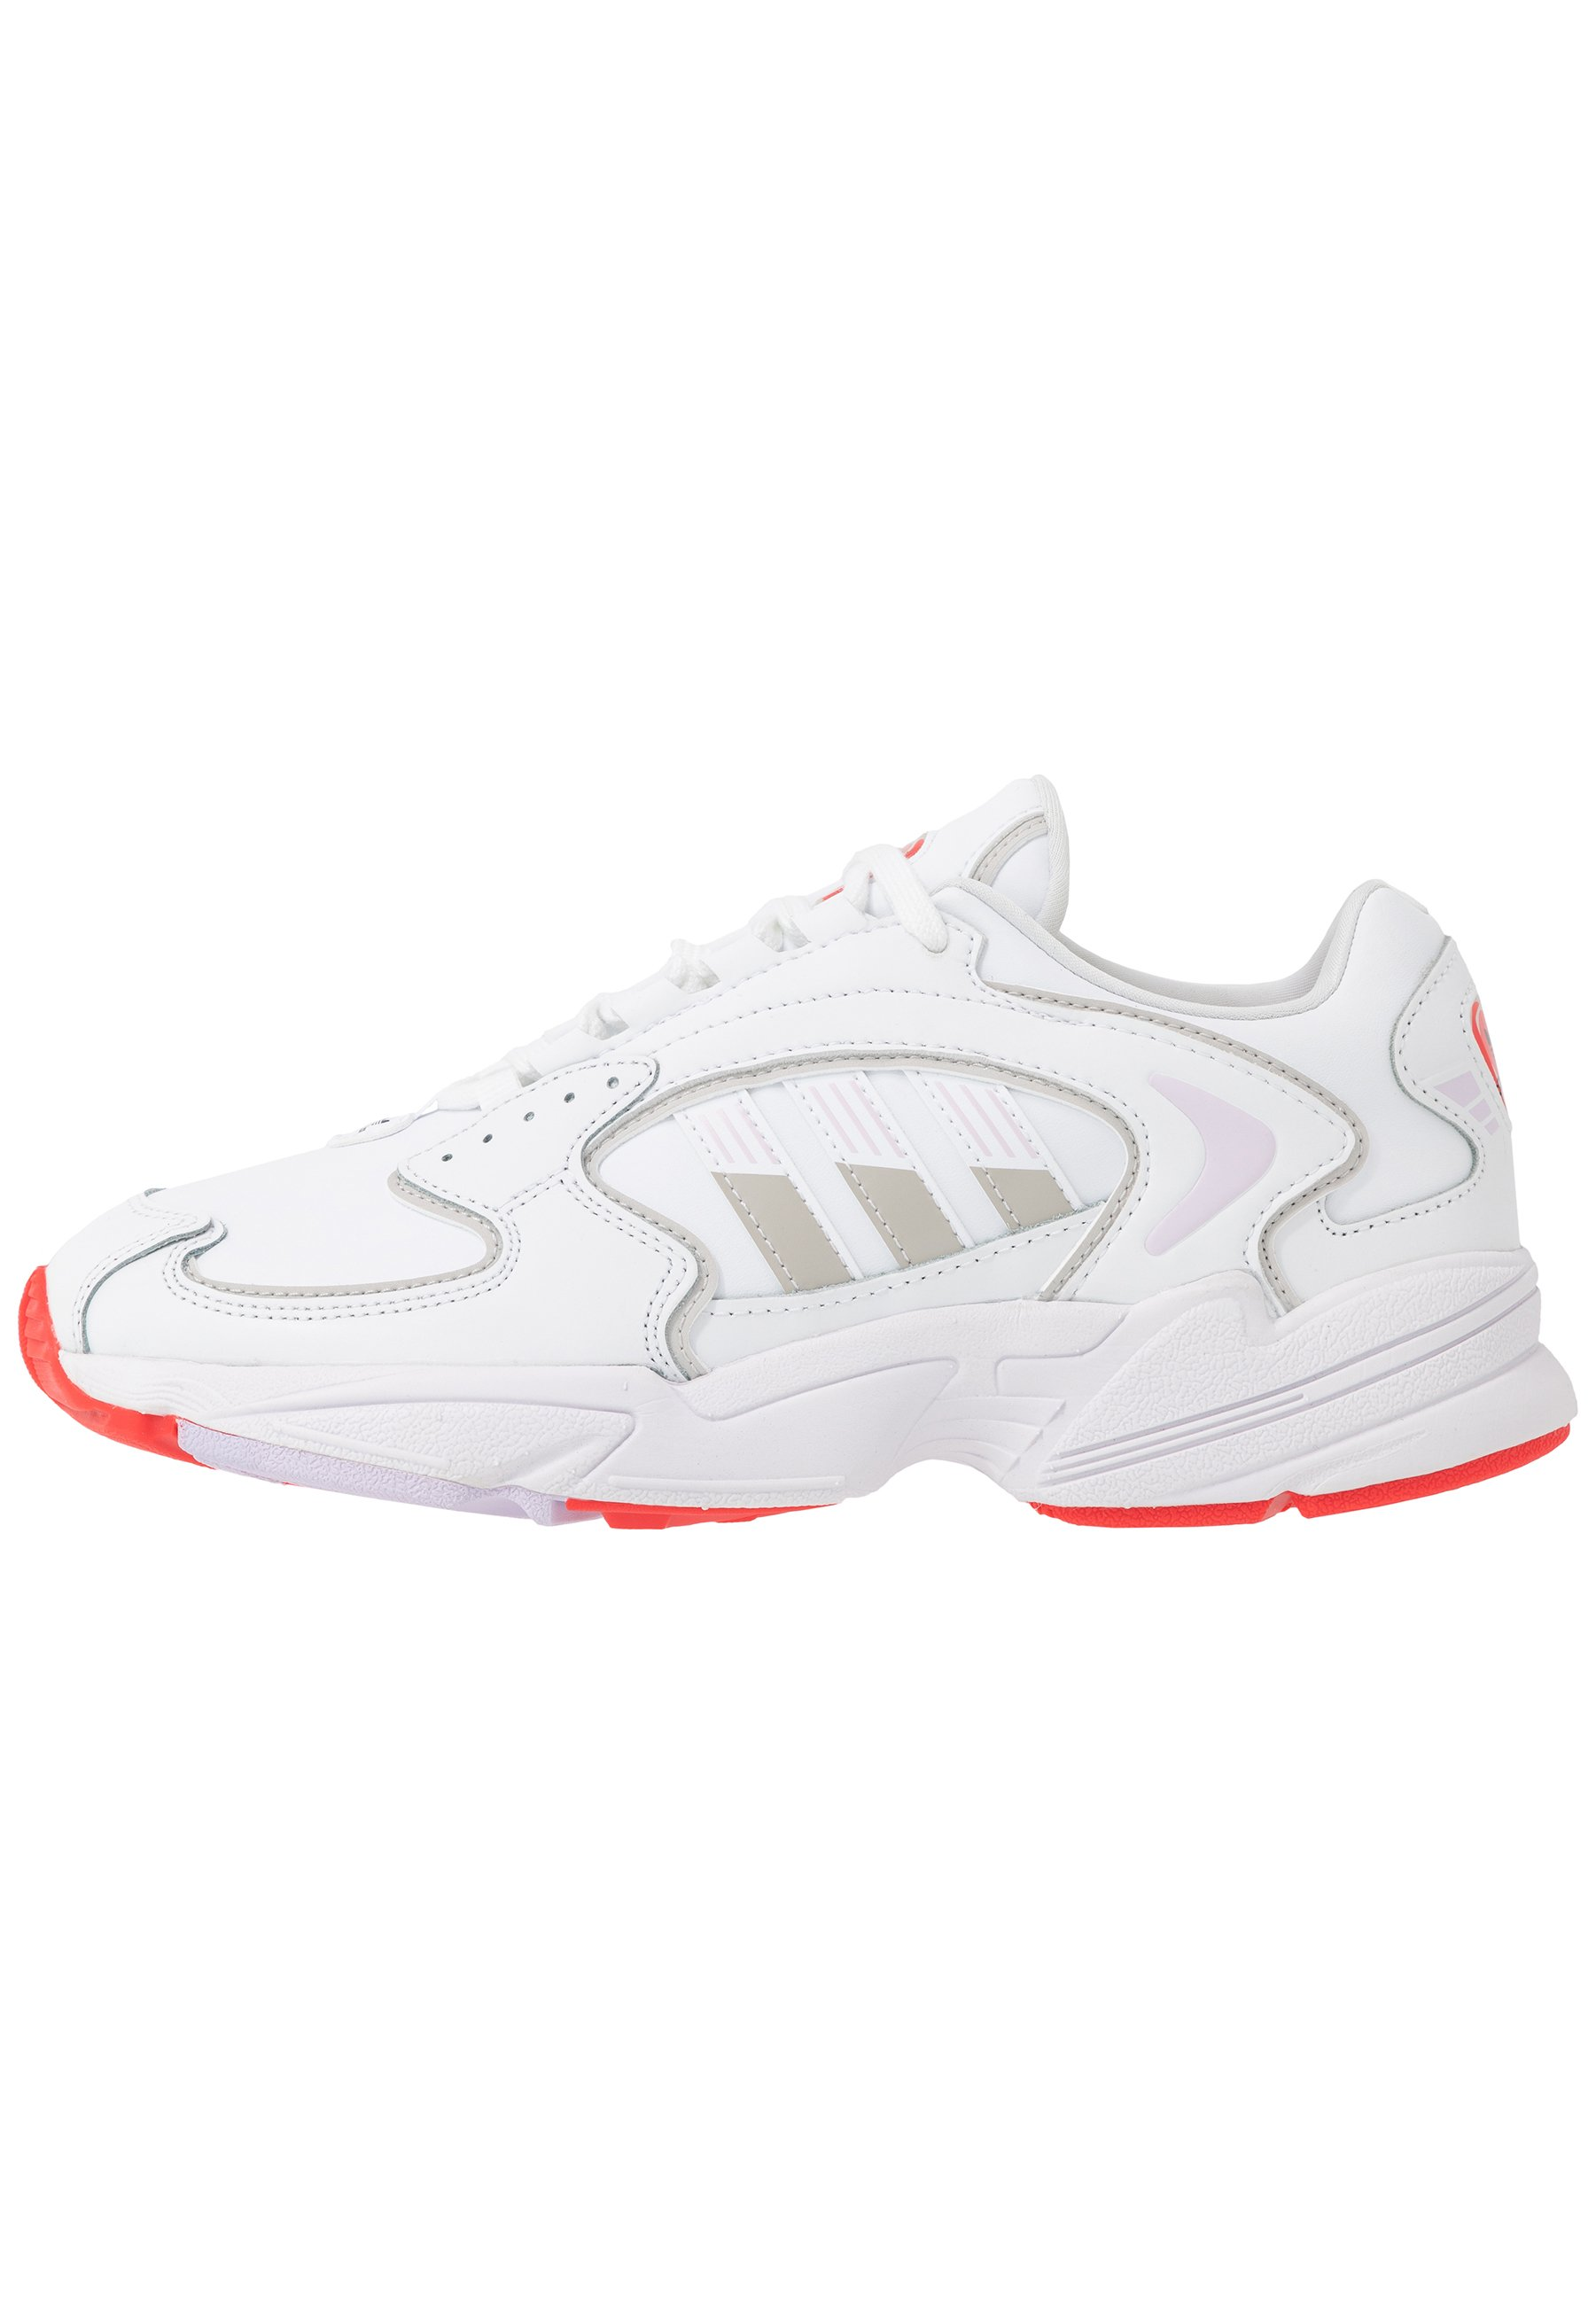 Adidas Originals 2000 - Sneakersy Niskie Footwear White/grey One/purple Tint